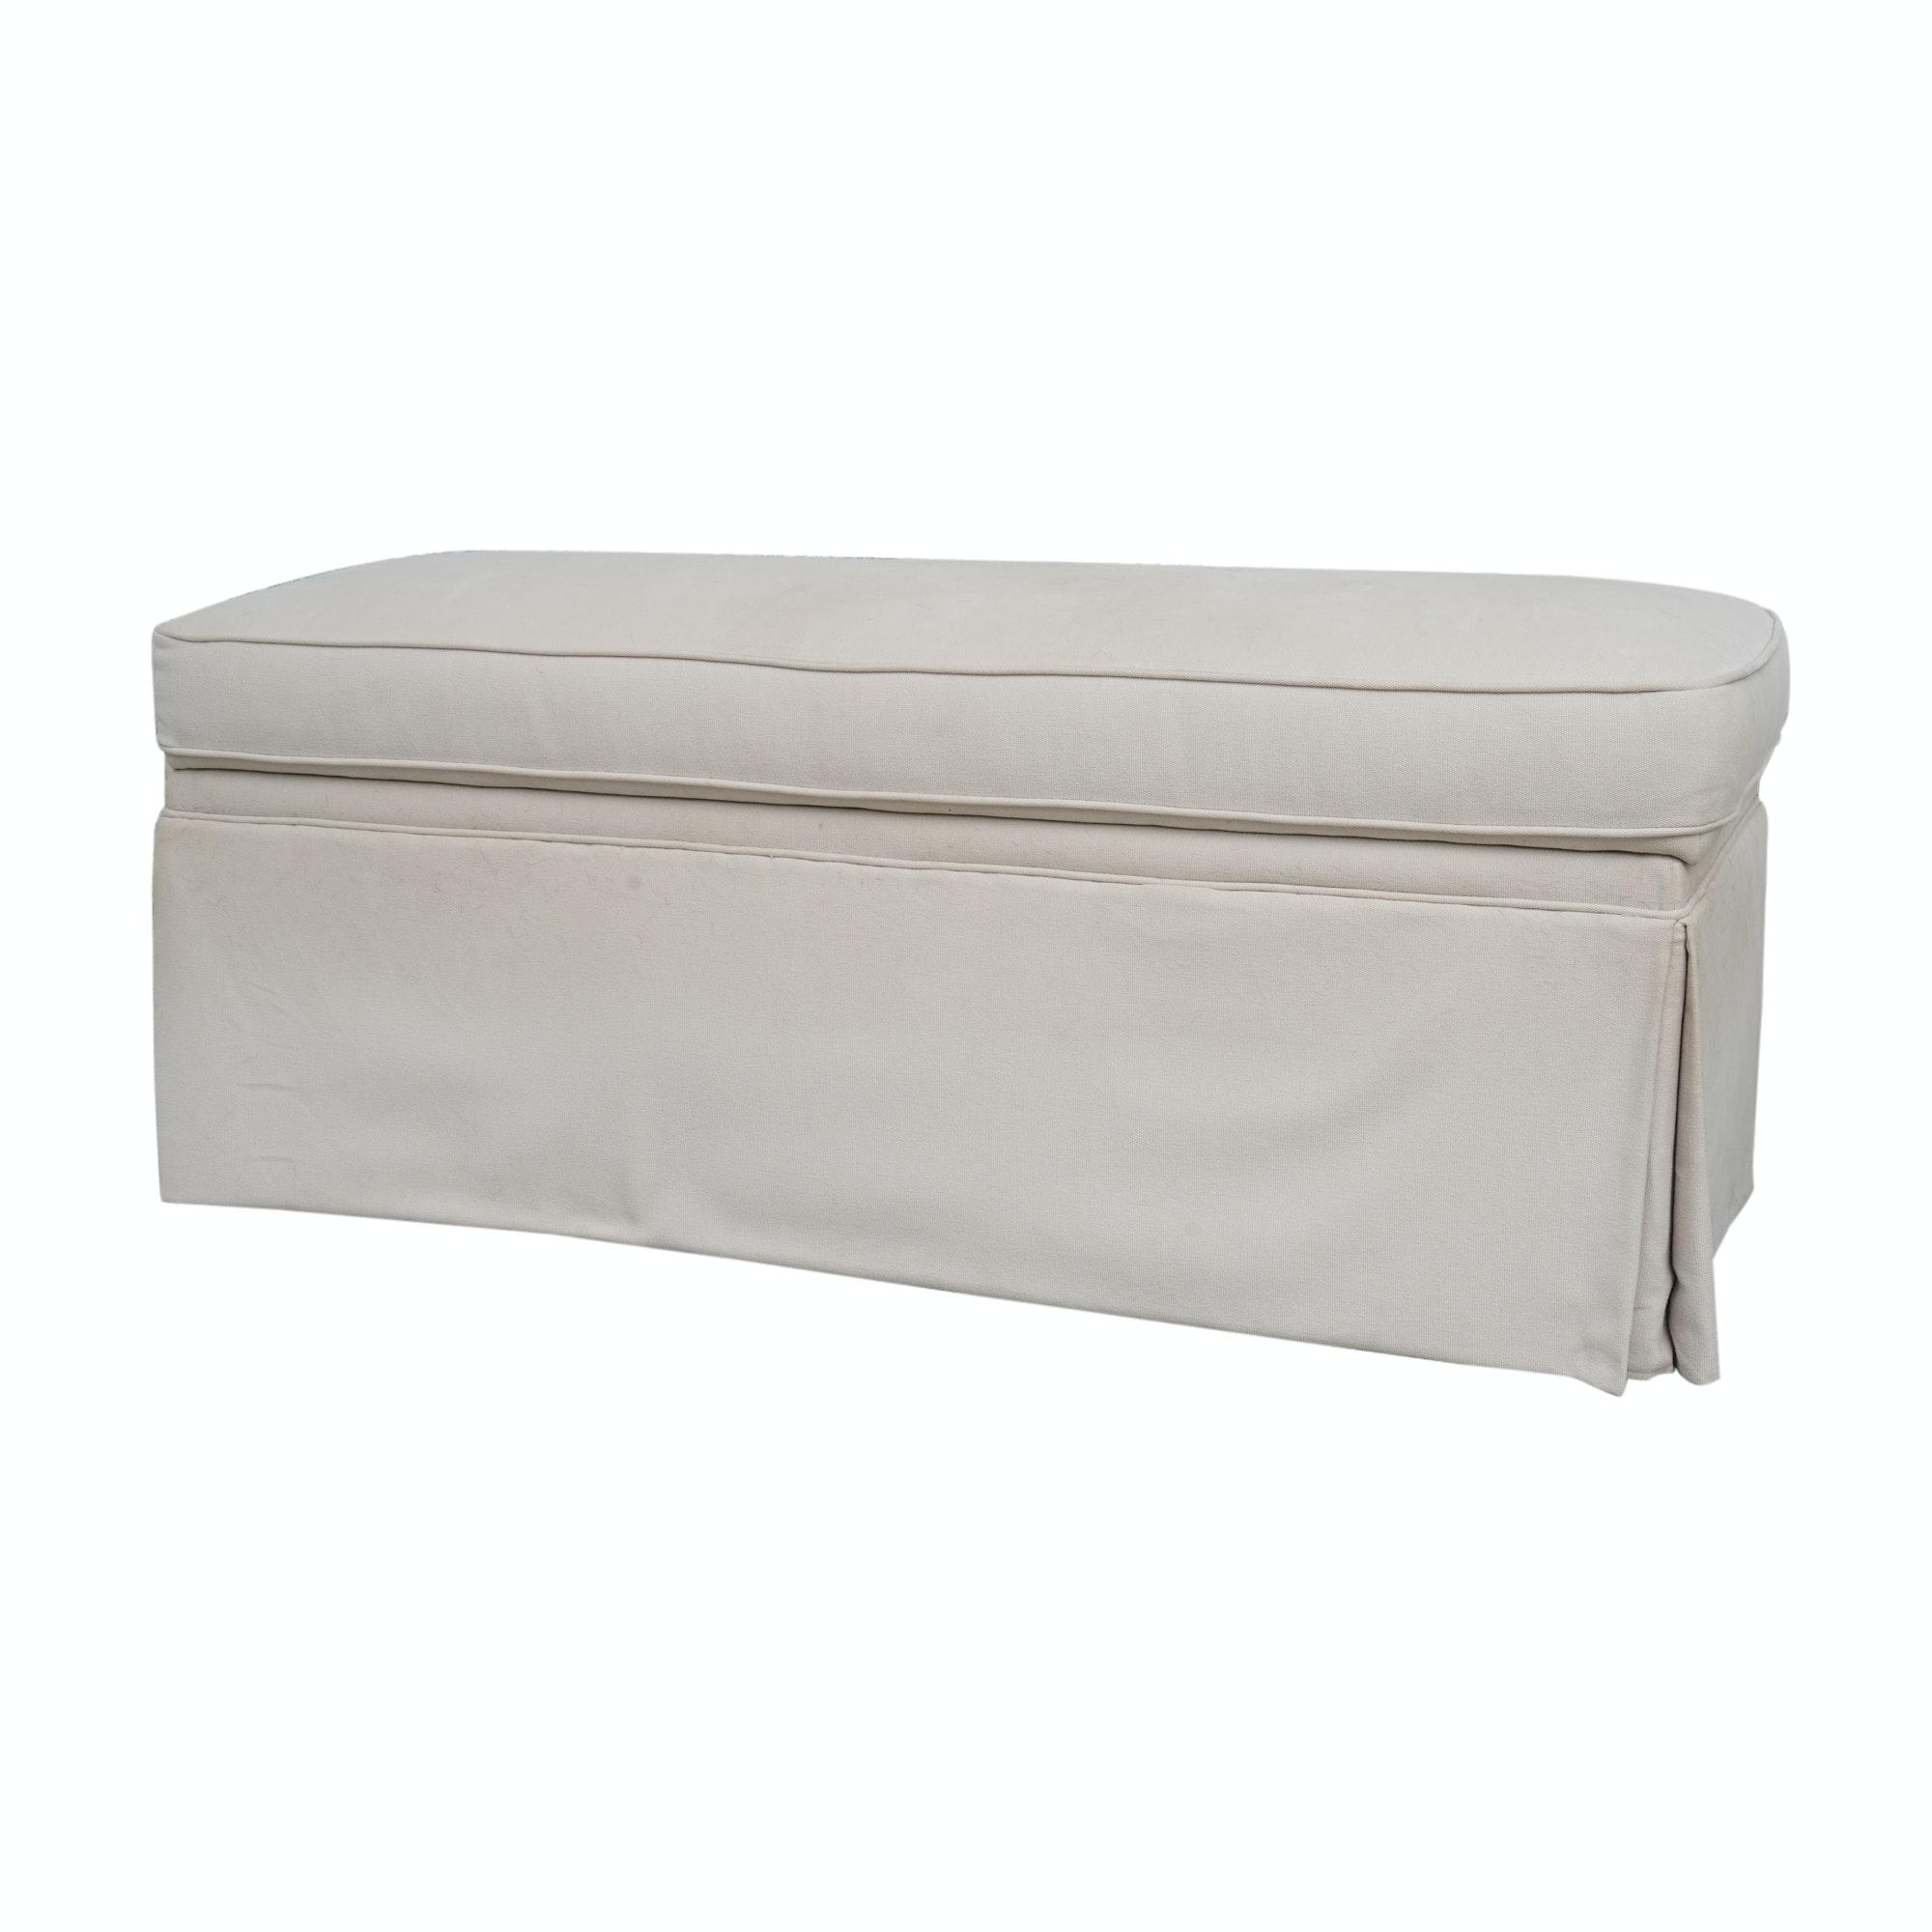 Upholstered Storage Bench by Bassett